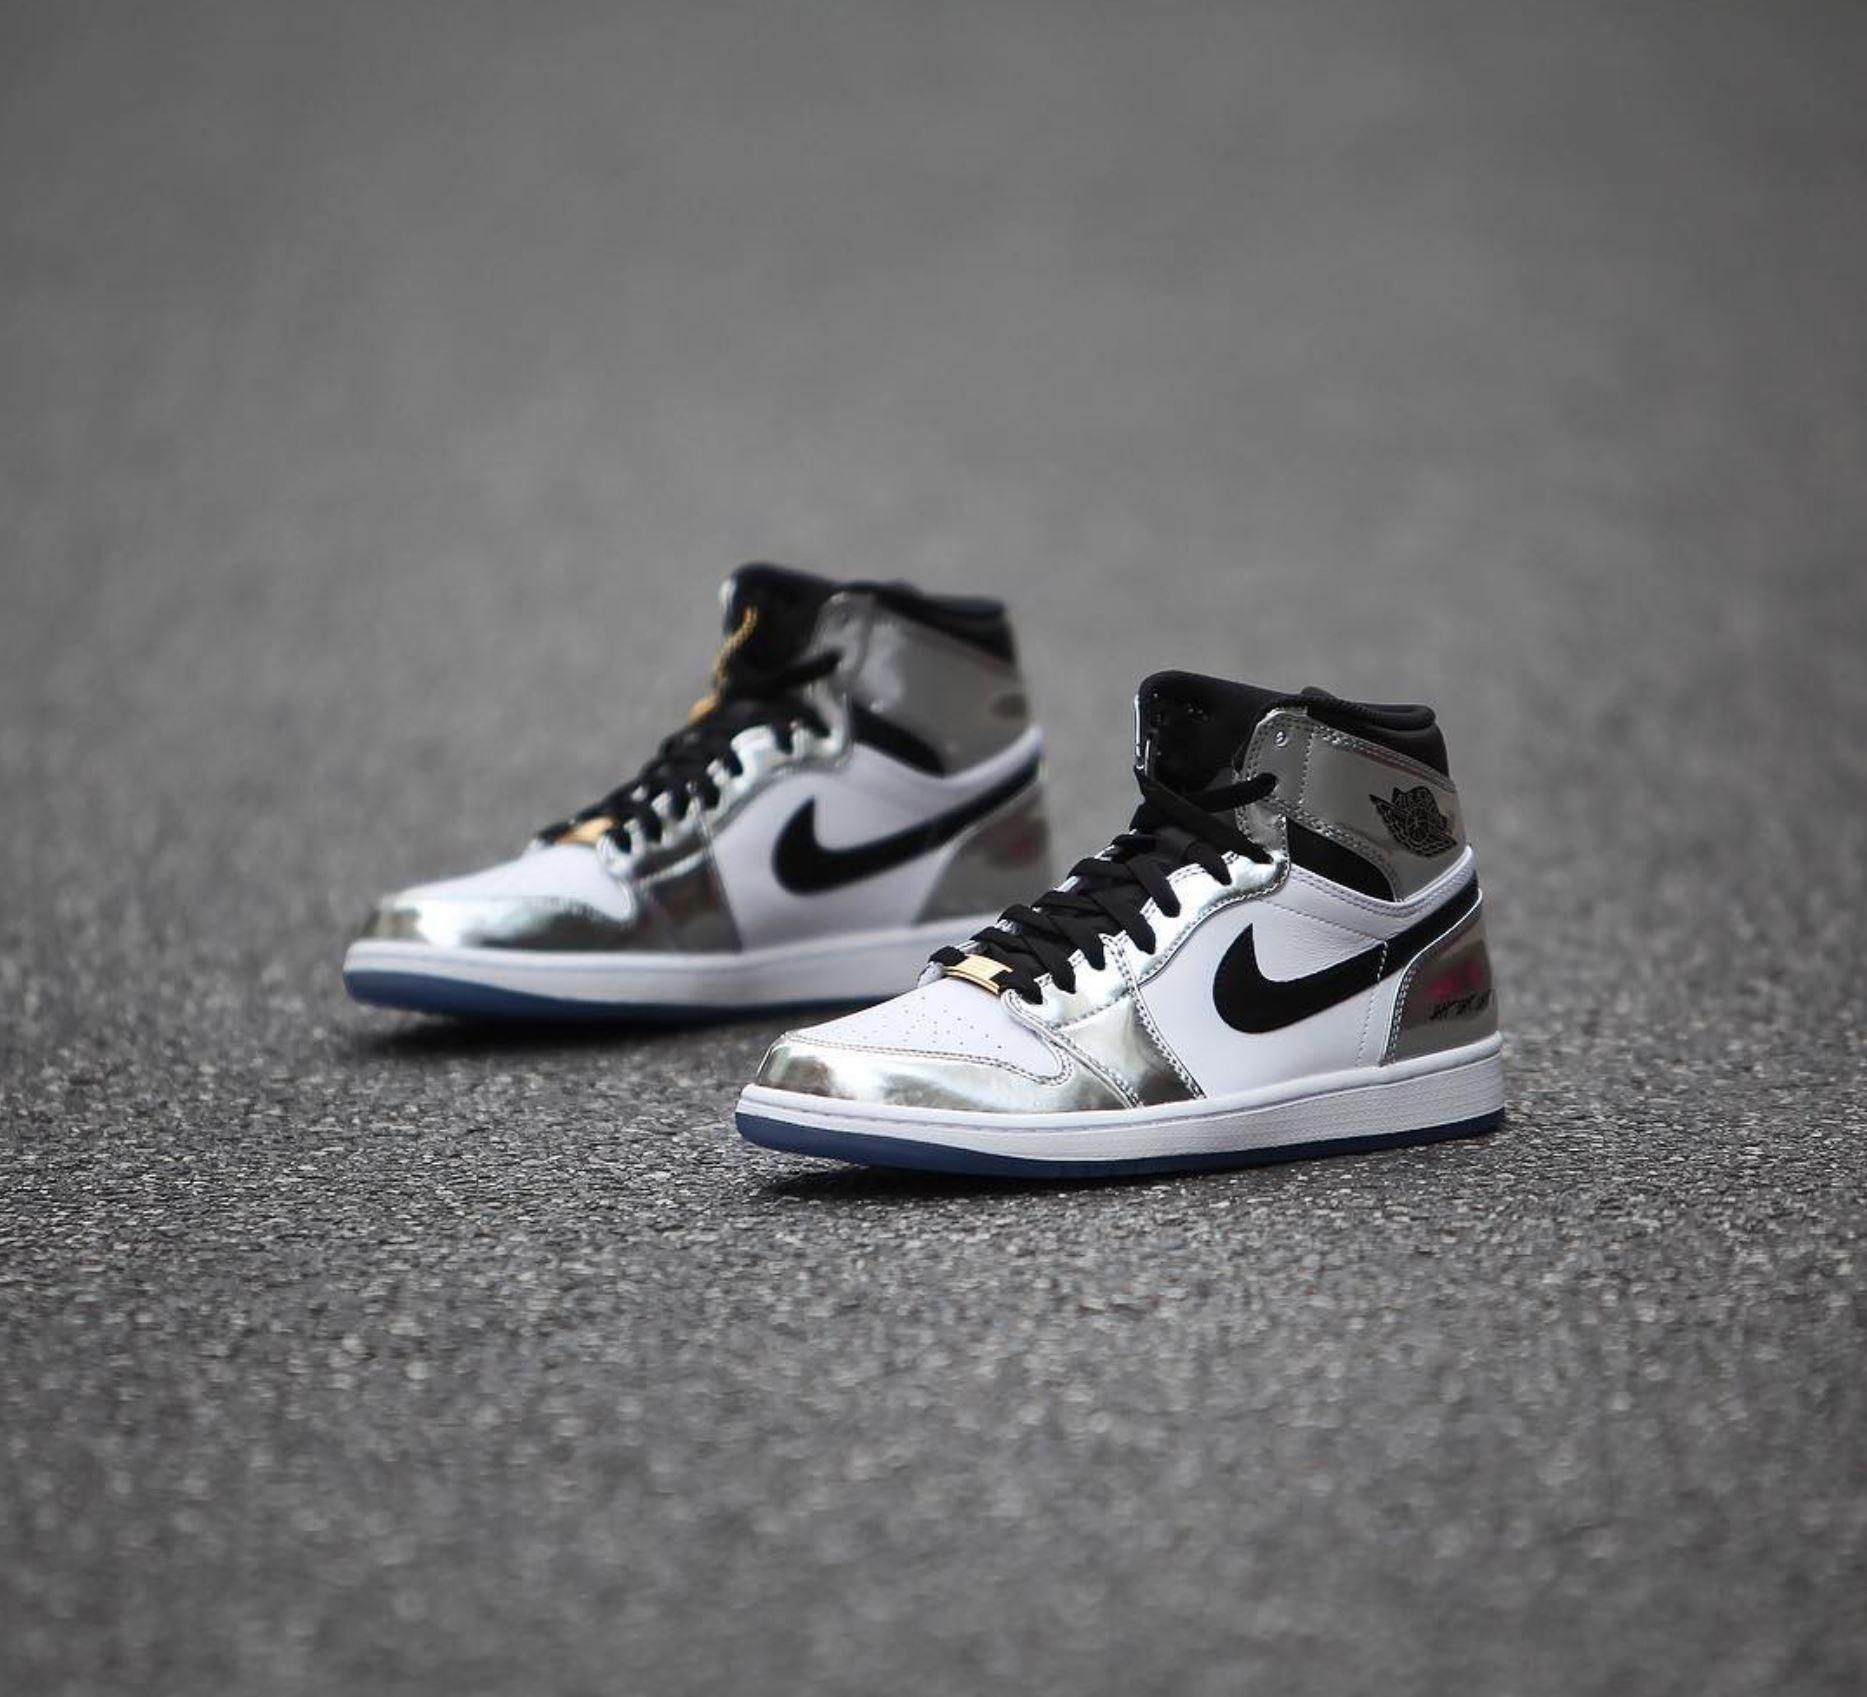 best sneakers cf238 6a971 kawhi leonard air jordan 1 pass the torch 3 - WearTesters